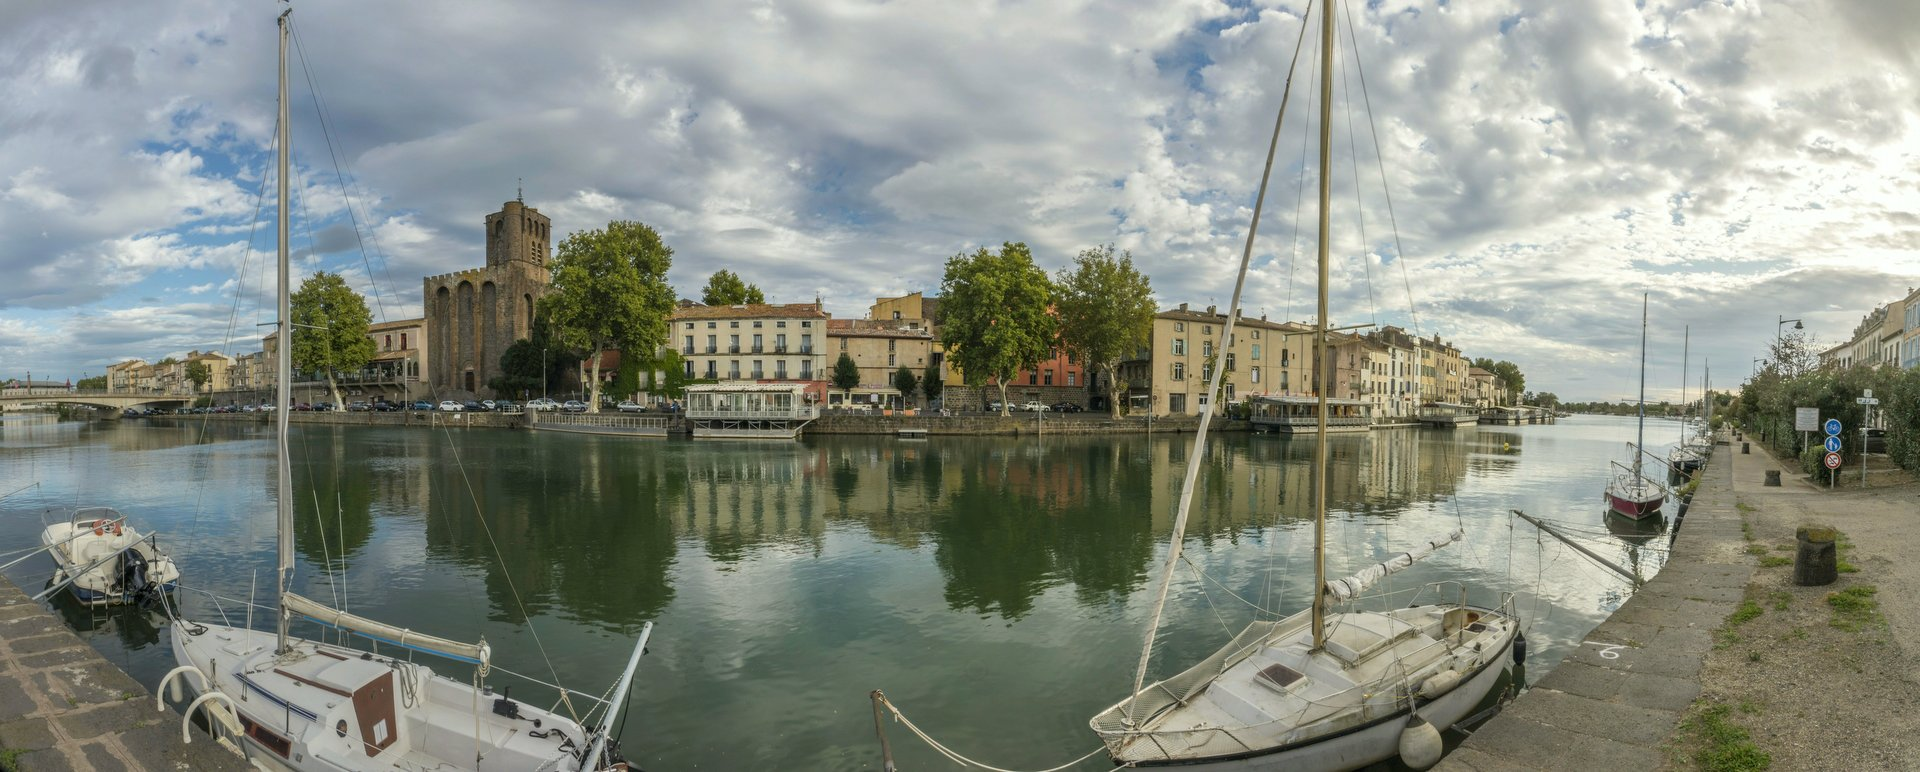 Agde und Hérault vom Quai Commandant Réveille in Agde